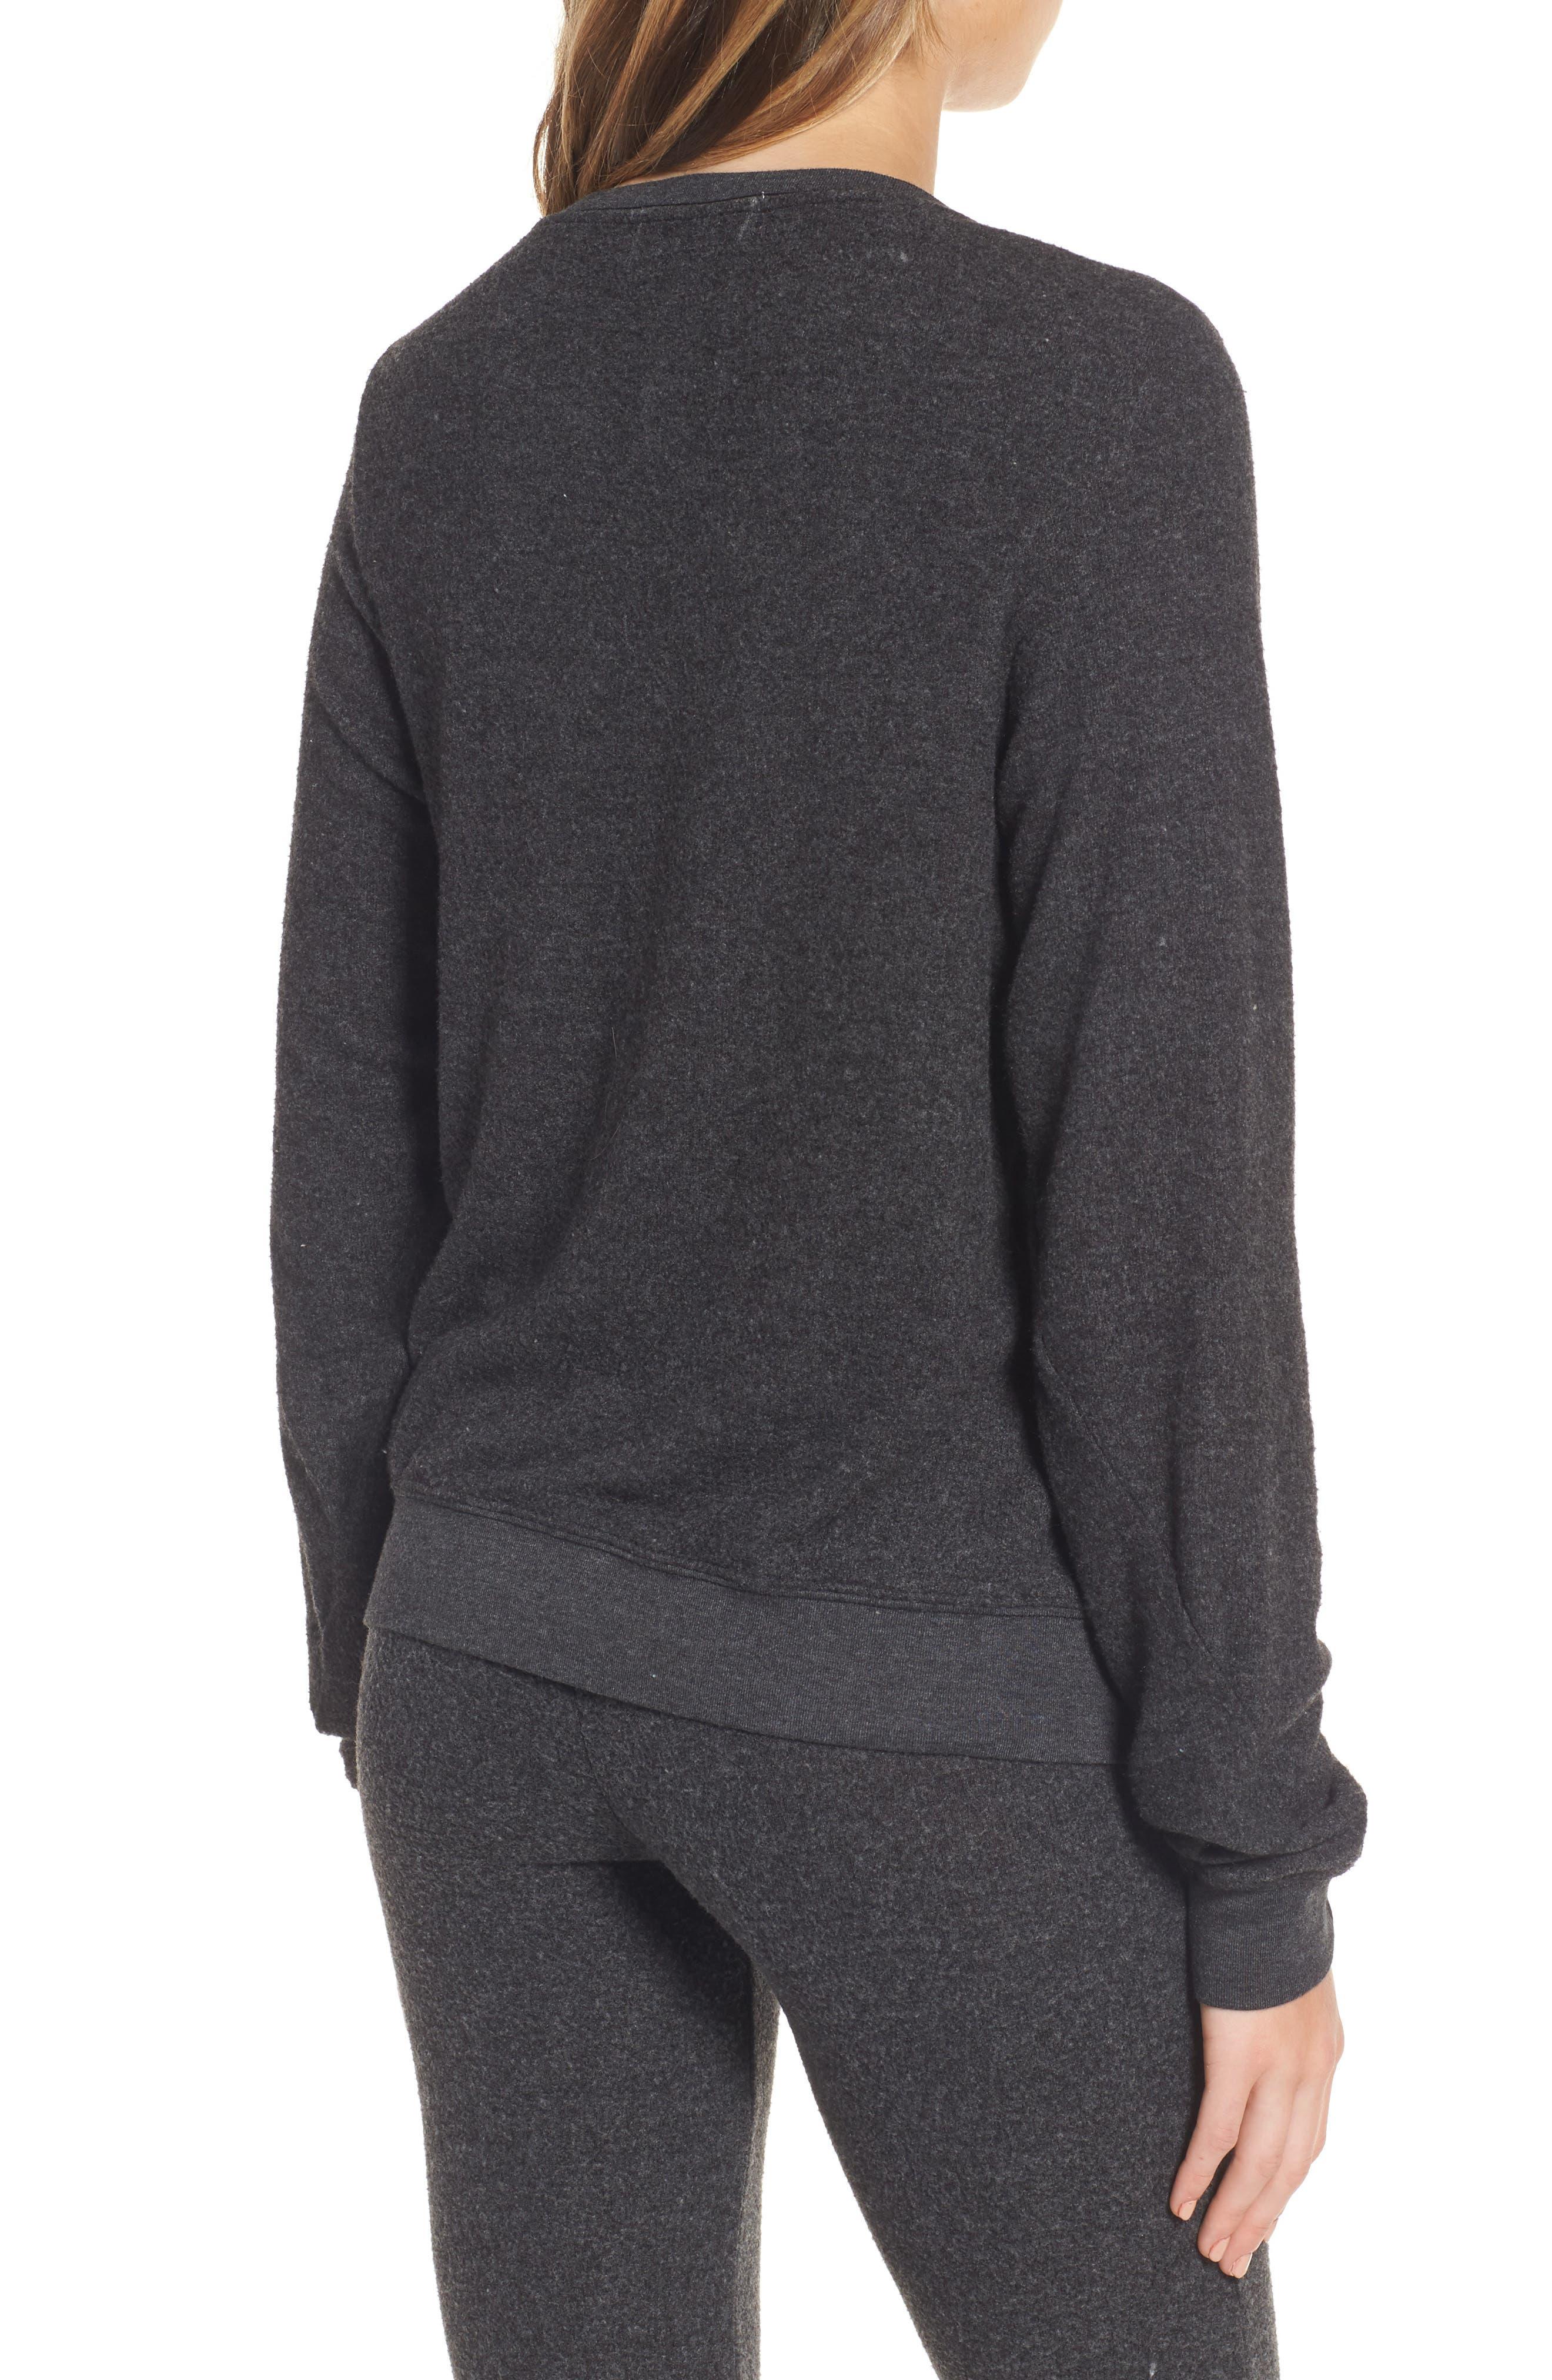 Salty Hair Sweatshirt,                             Alternate thumbnail 2, color,                             001